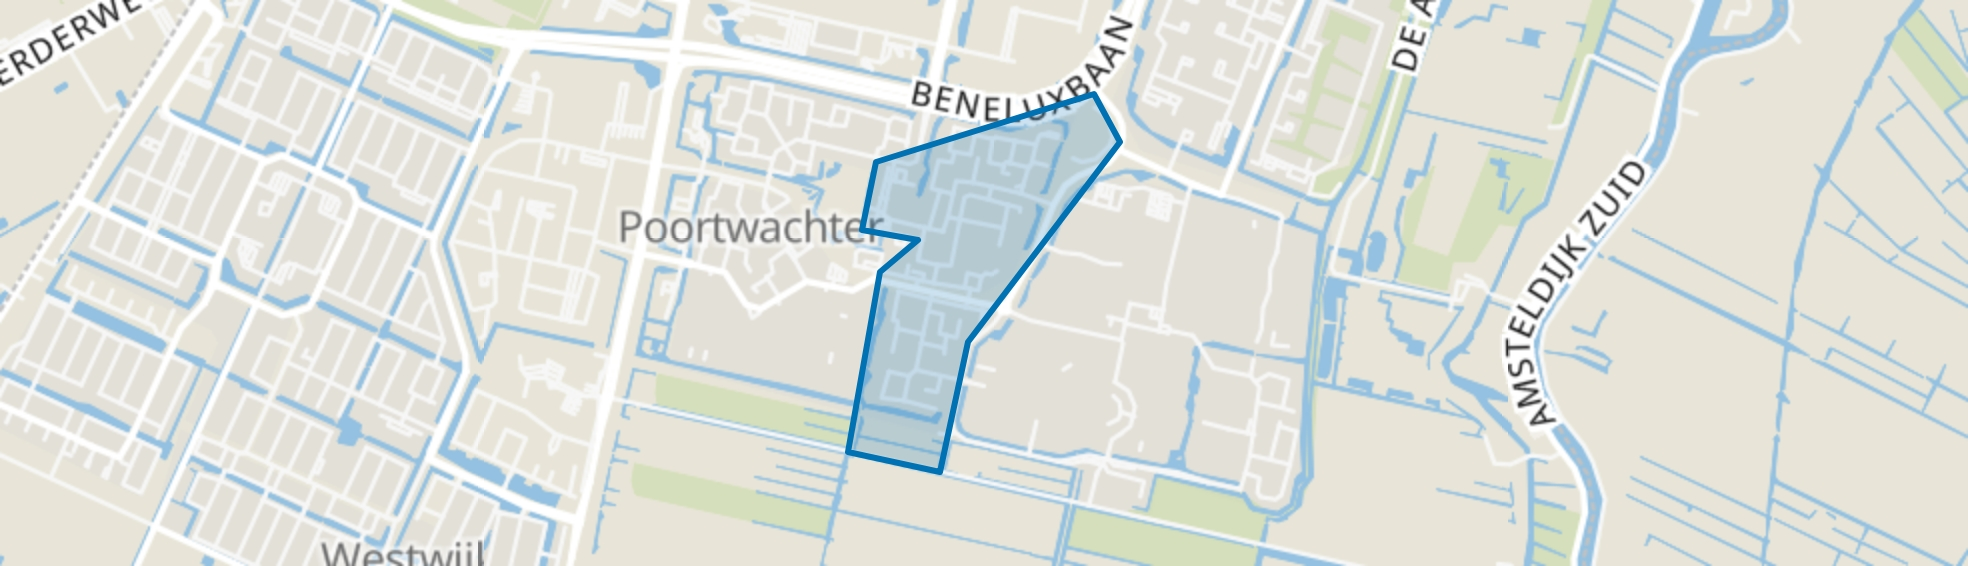 Hemellichamenbuurt, Amstelveen map